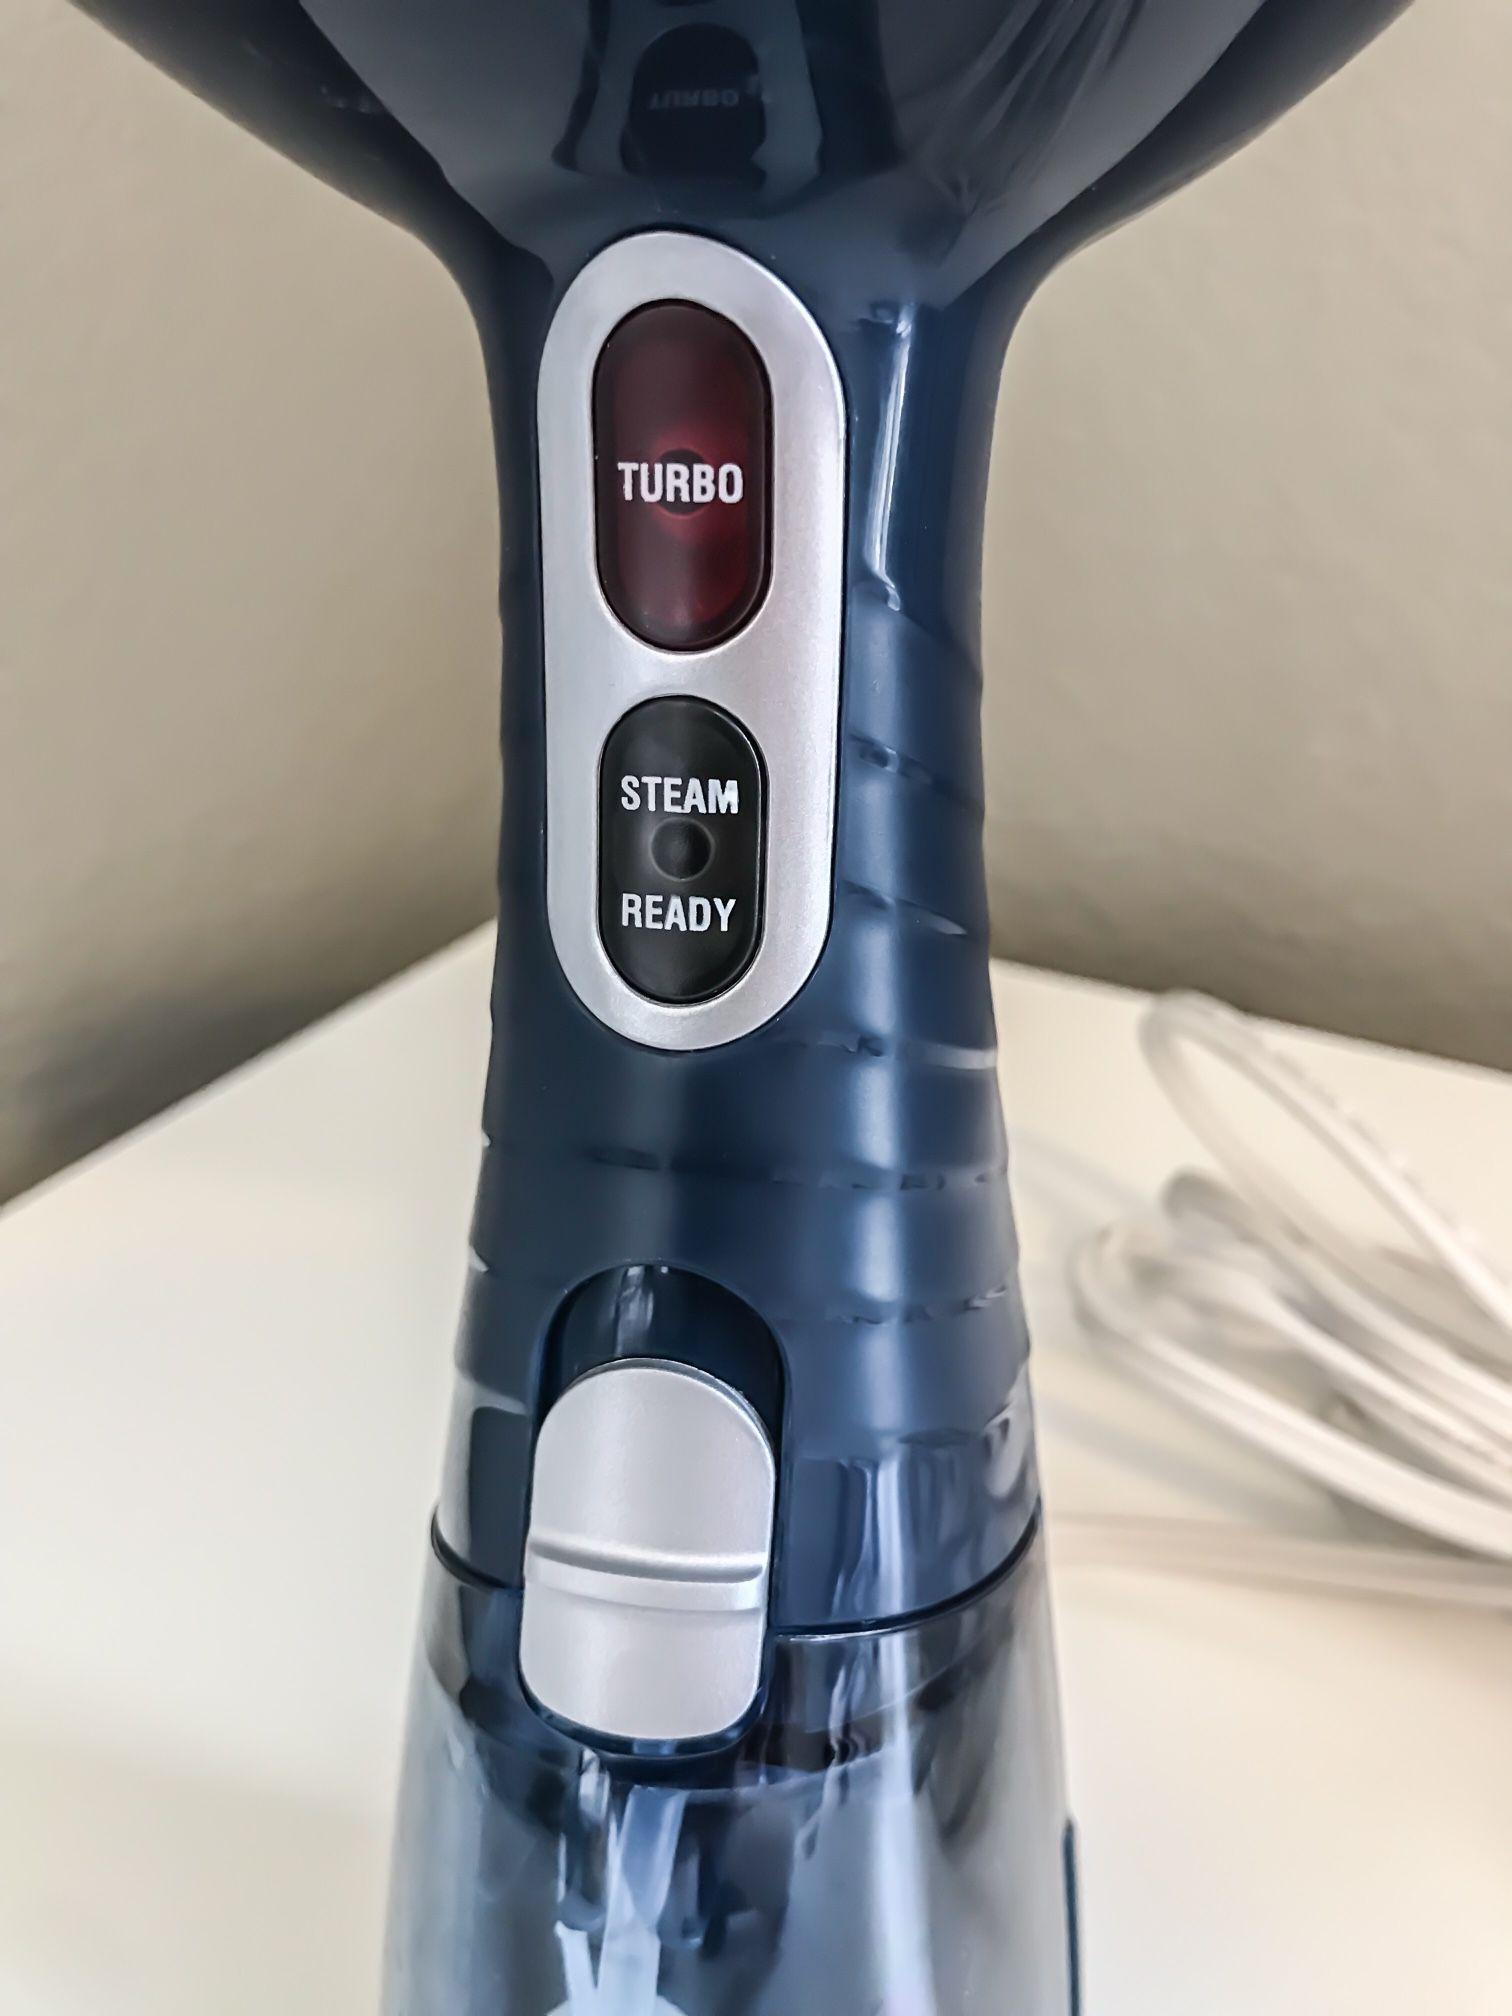 Conair Turbo Extremesteam Portable Fabric Steamer